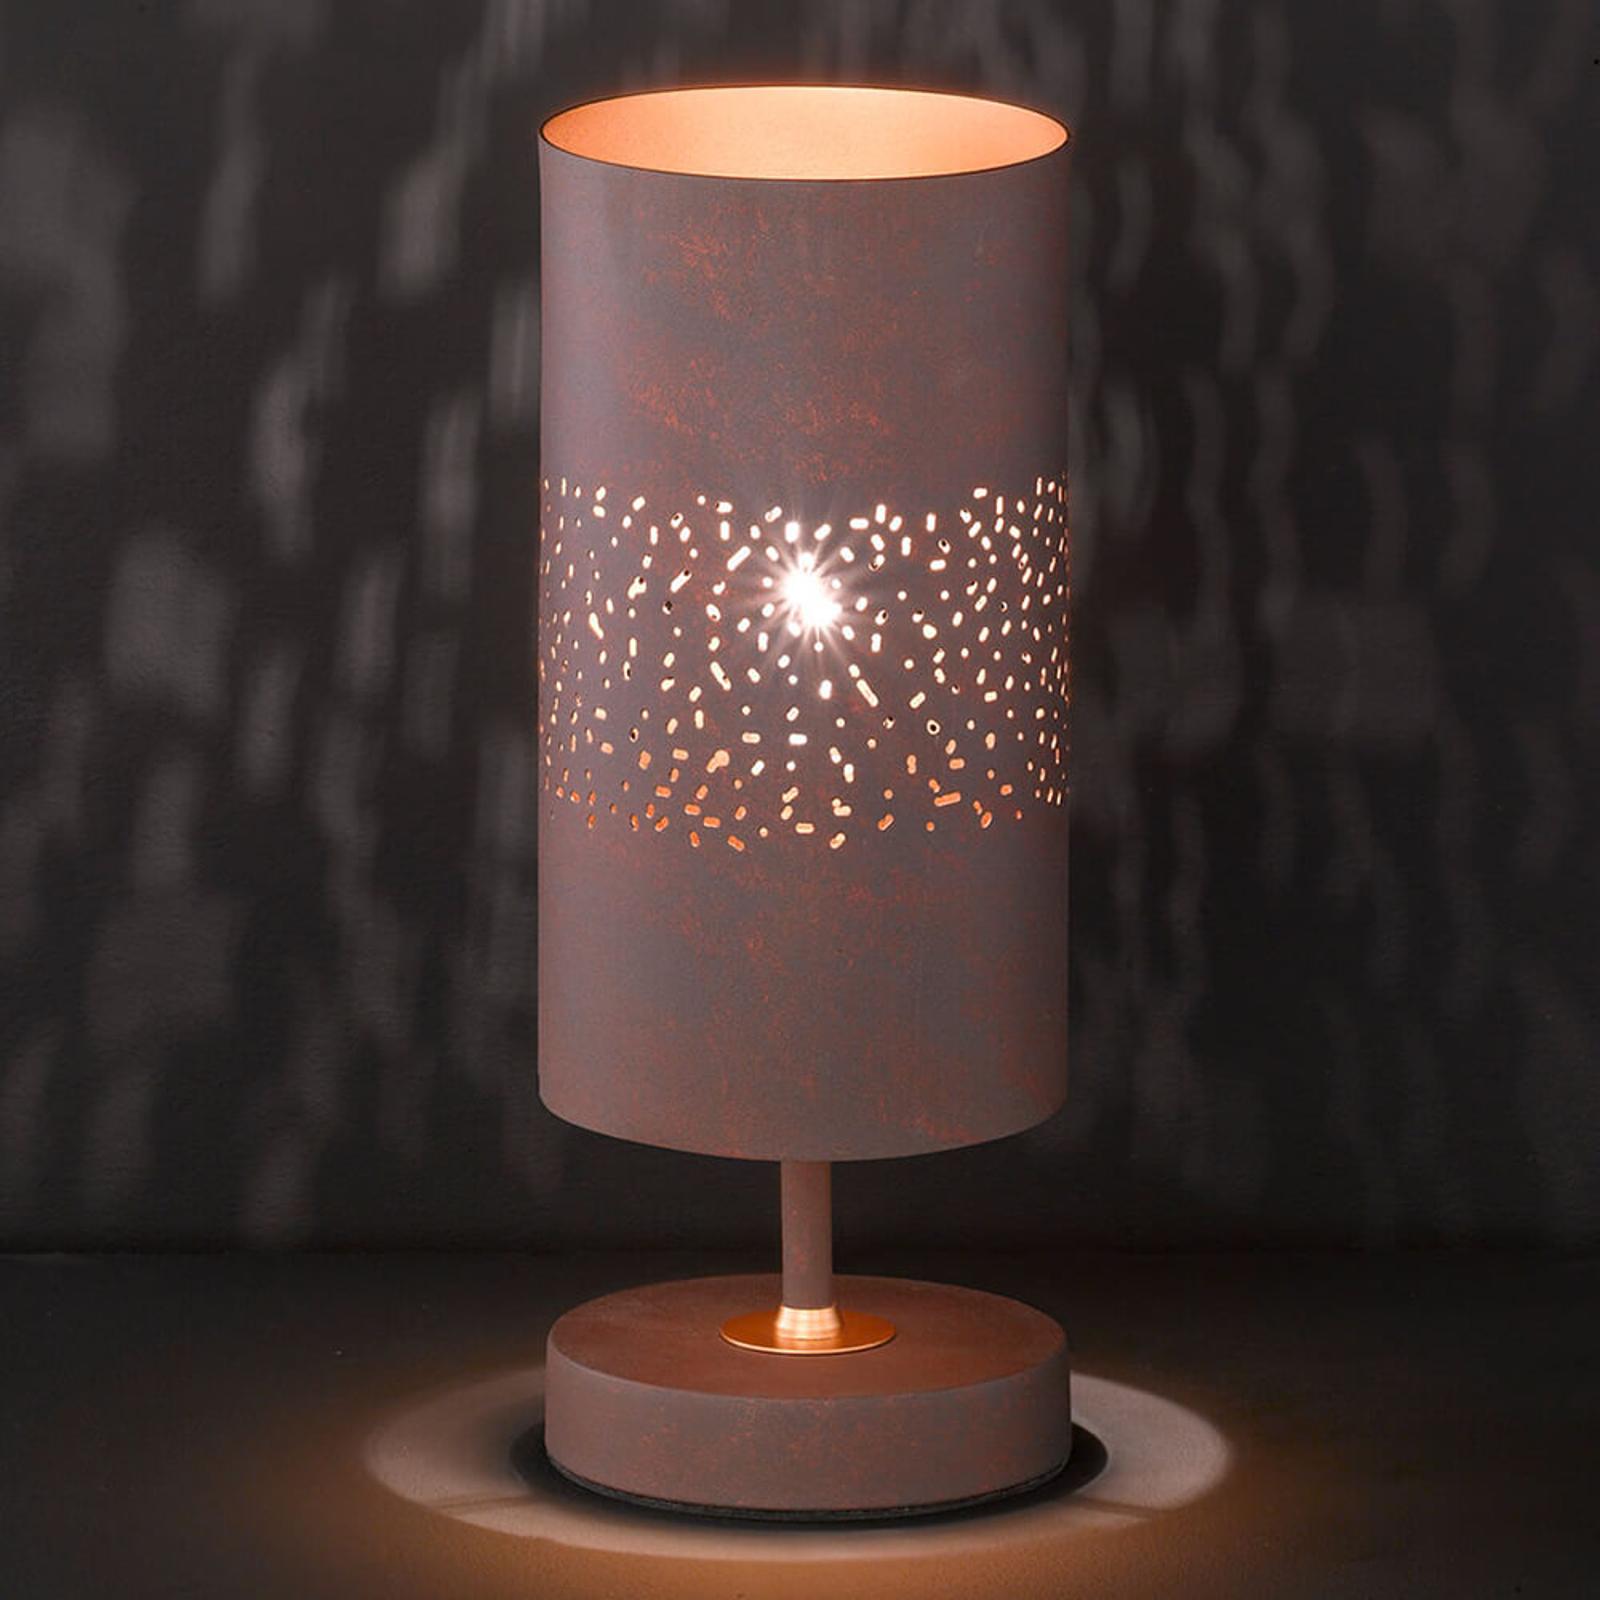 Metalen tafellamp Ancona in bruin-antiek